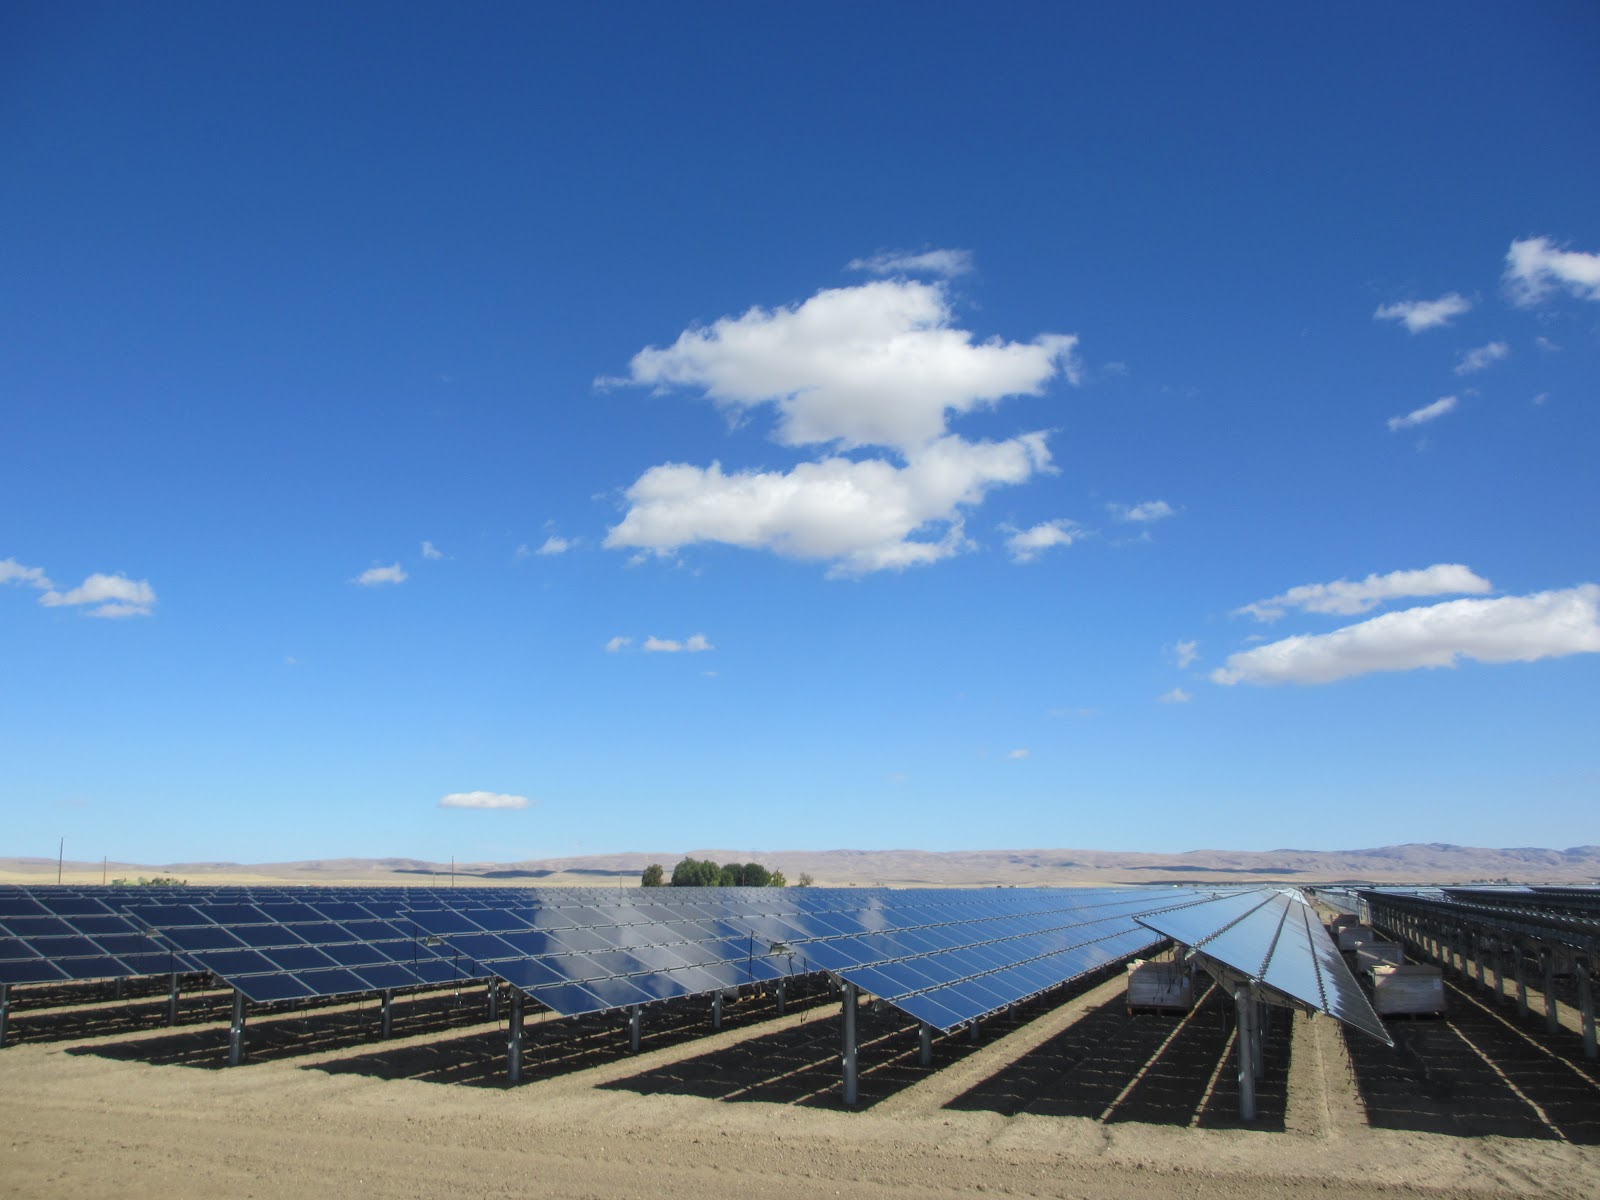 Solar panels Verry big wallpapers 1600x1200